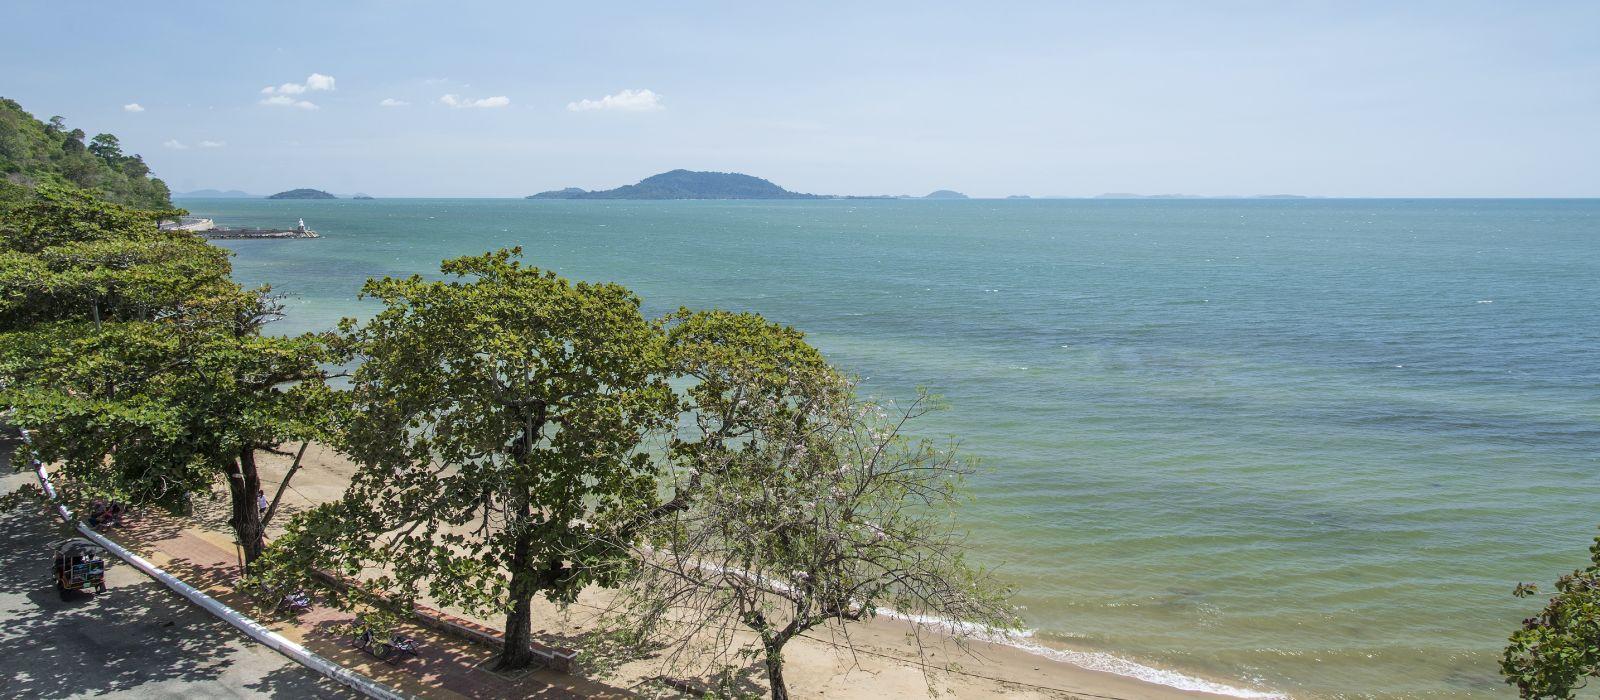 Hotel Samanea Beach resort Cambodia